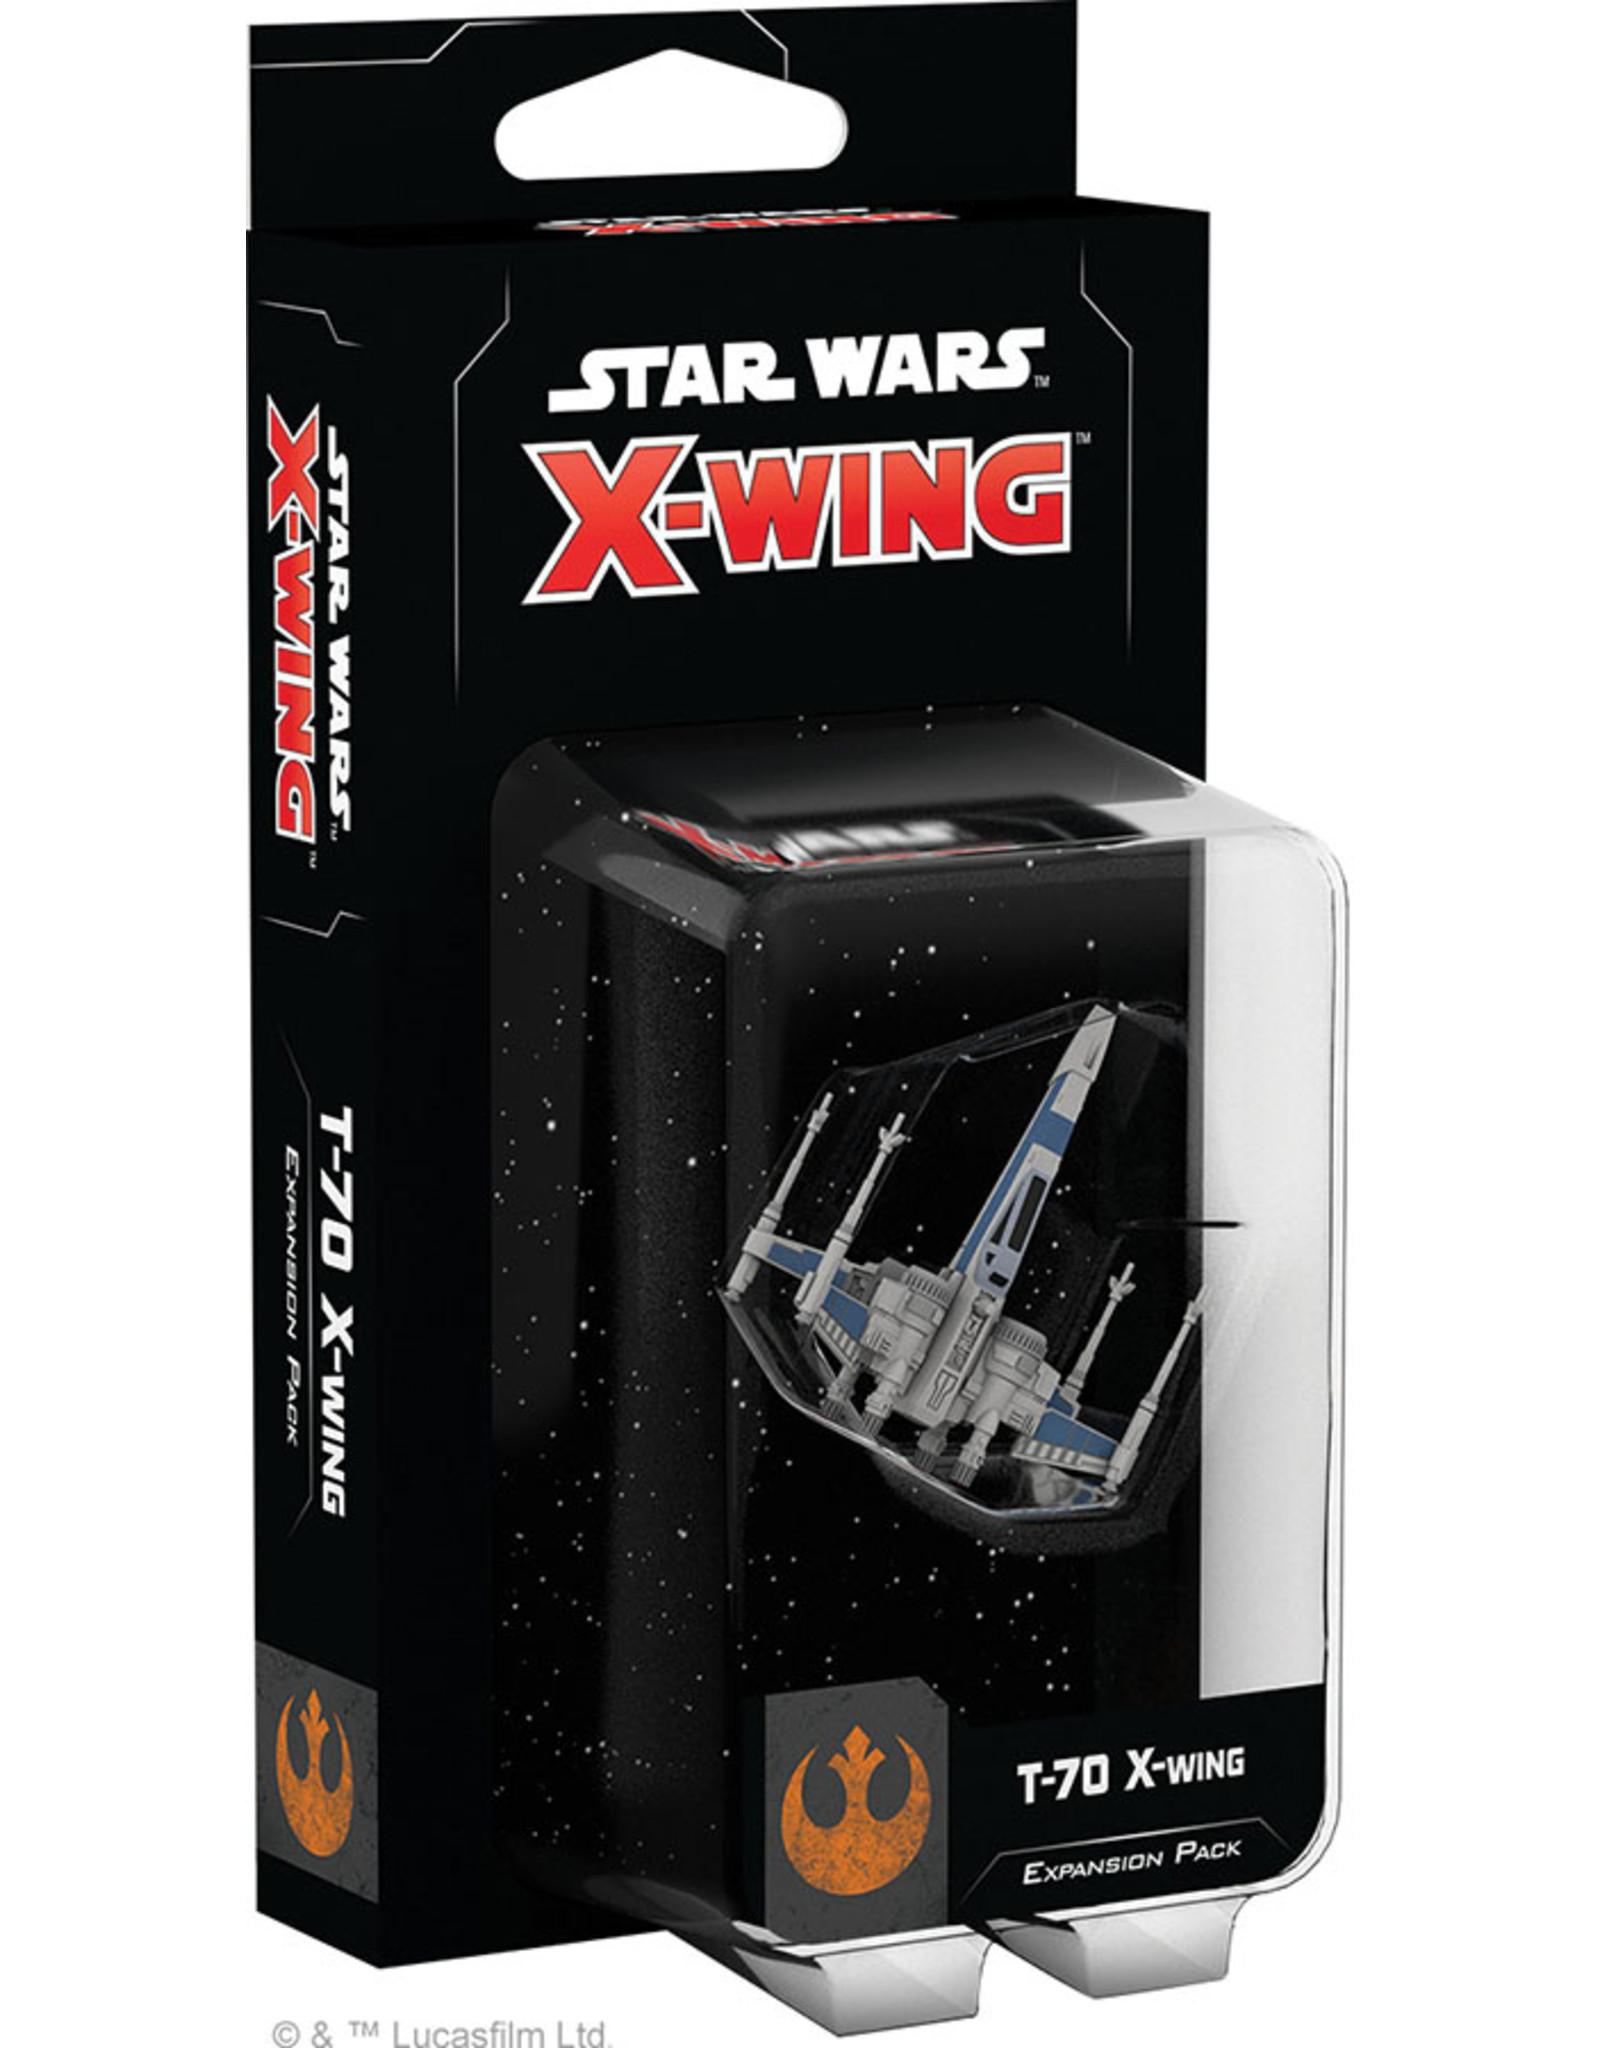 Fantasy Flight Games Star Wars X-Wing 2nd Edition - T-70 X-Wing